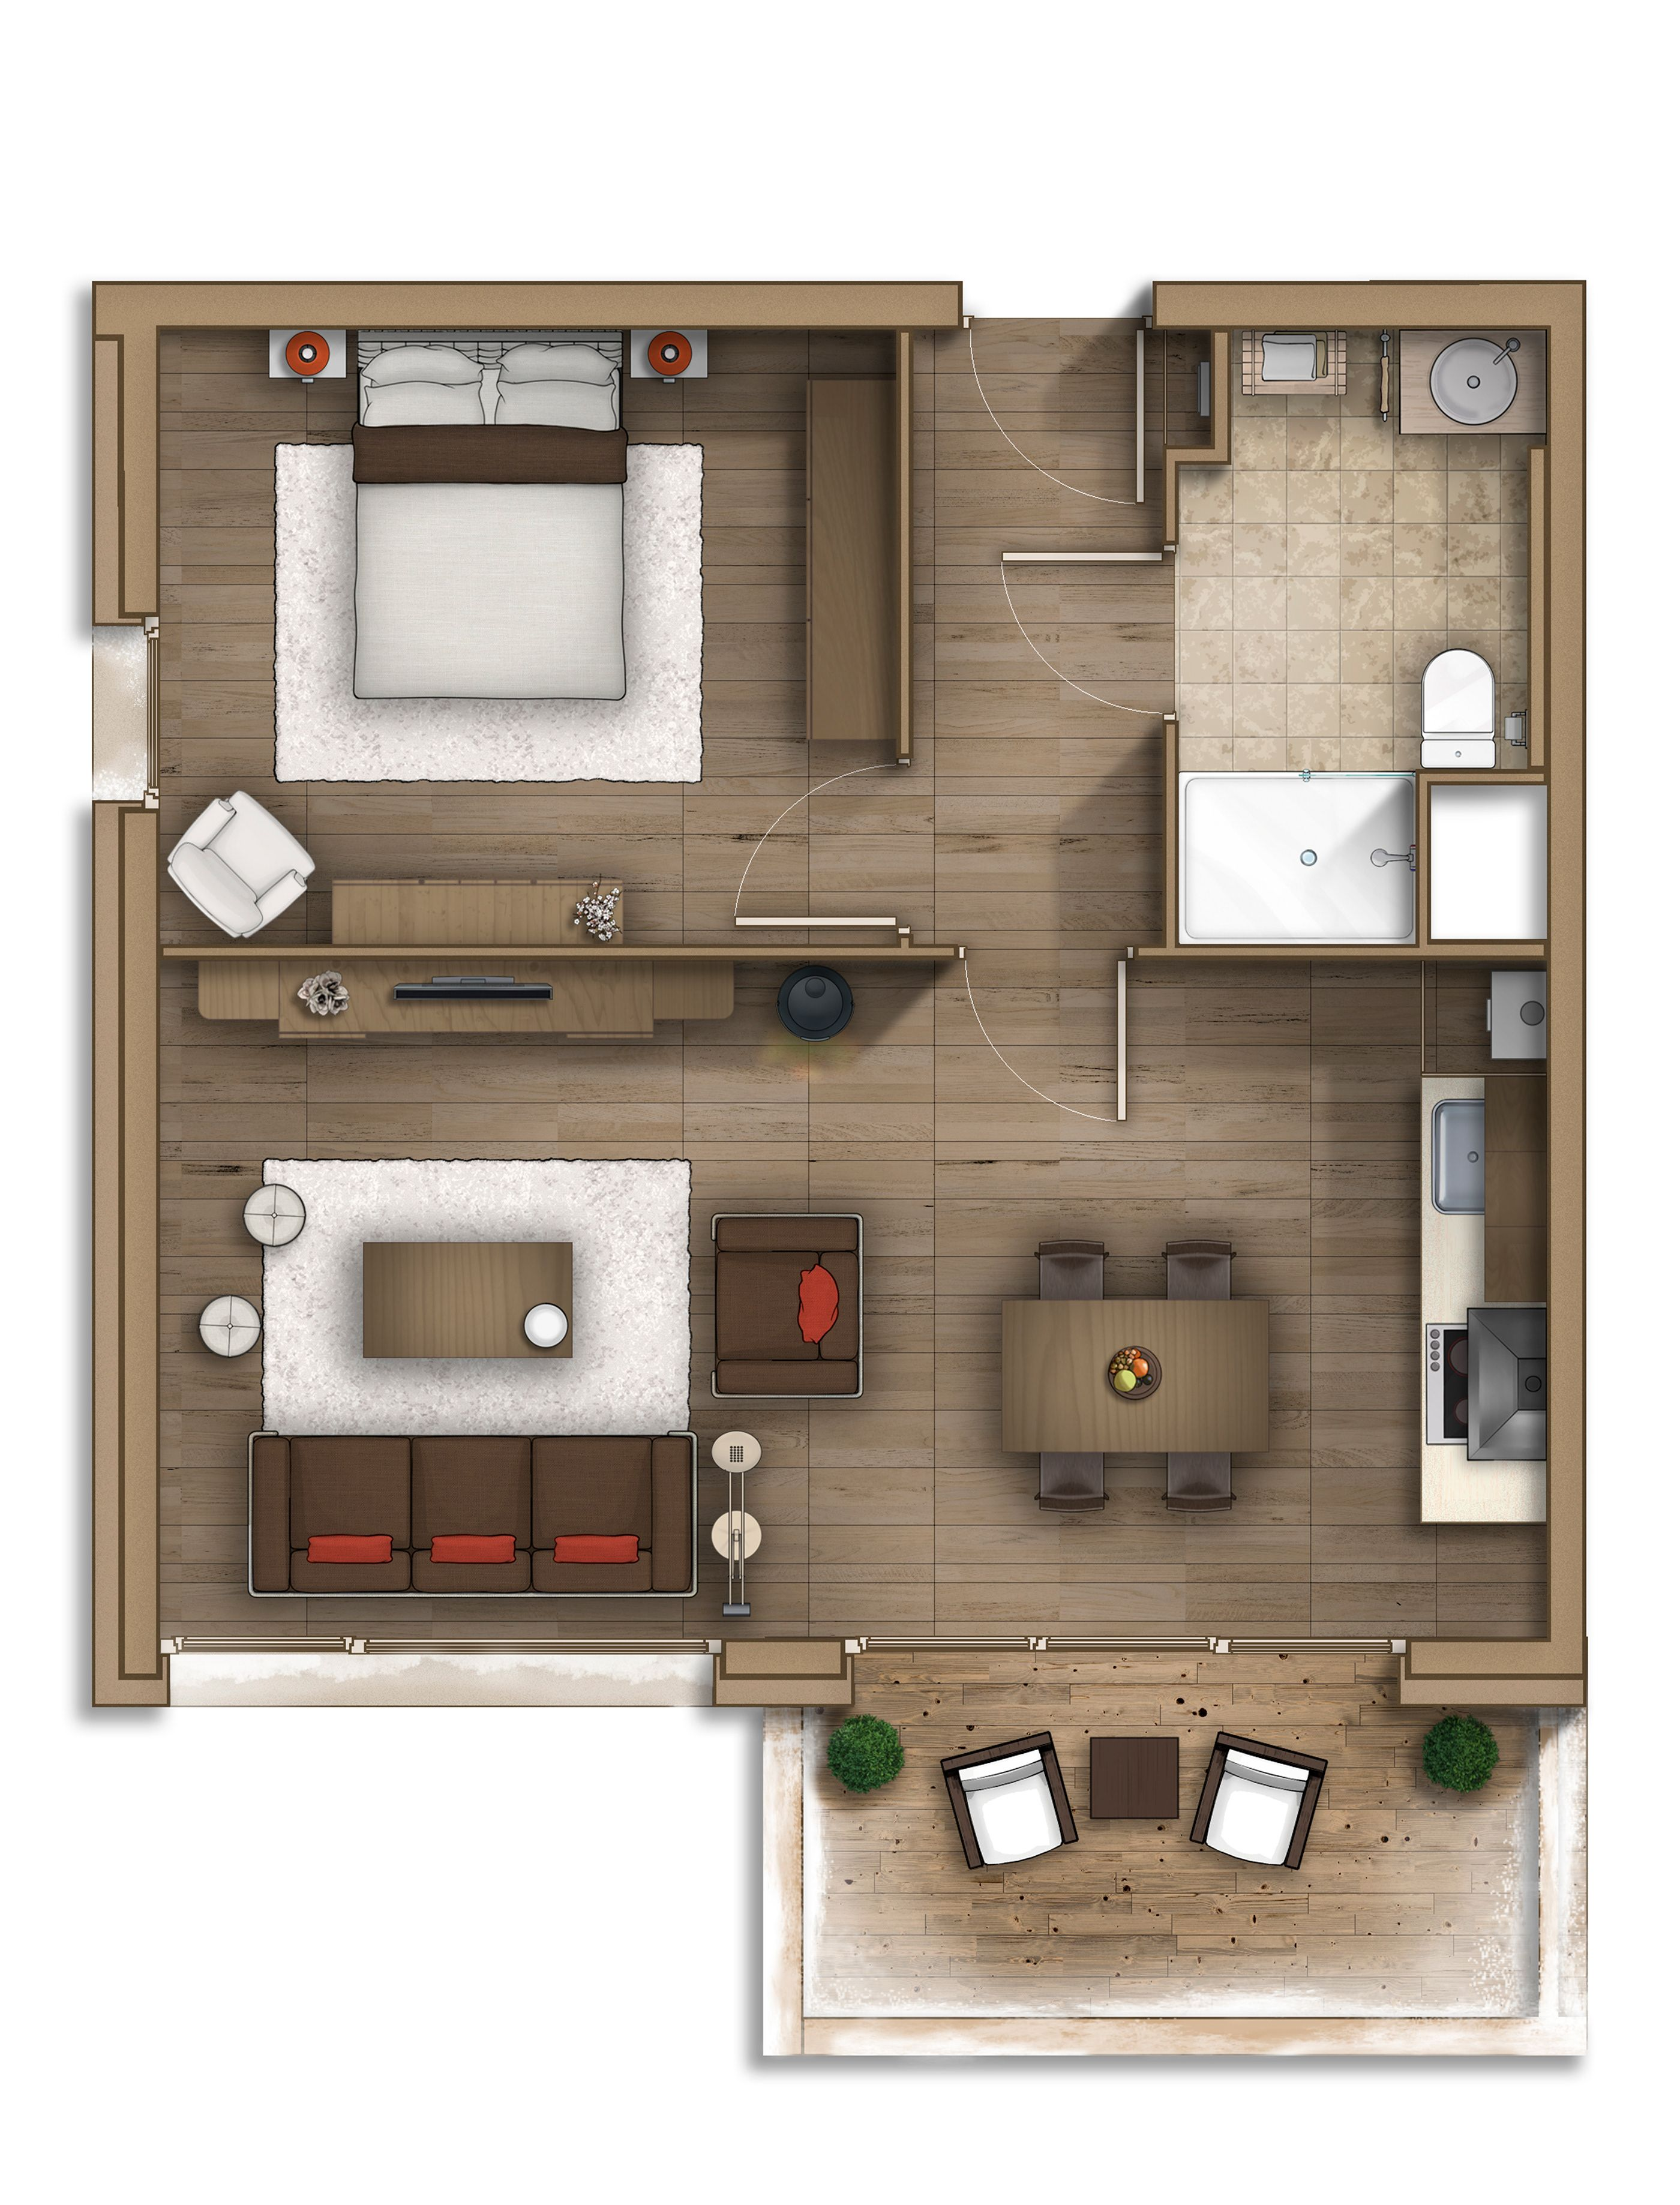 Floor plan rendering Alpes) France on Behance